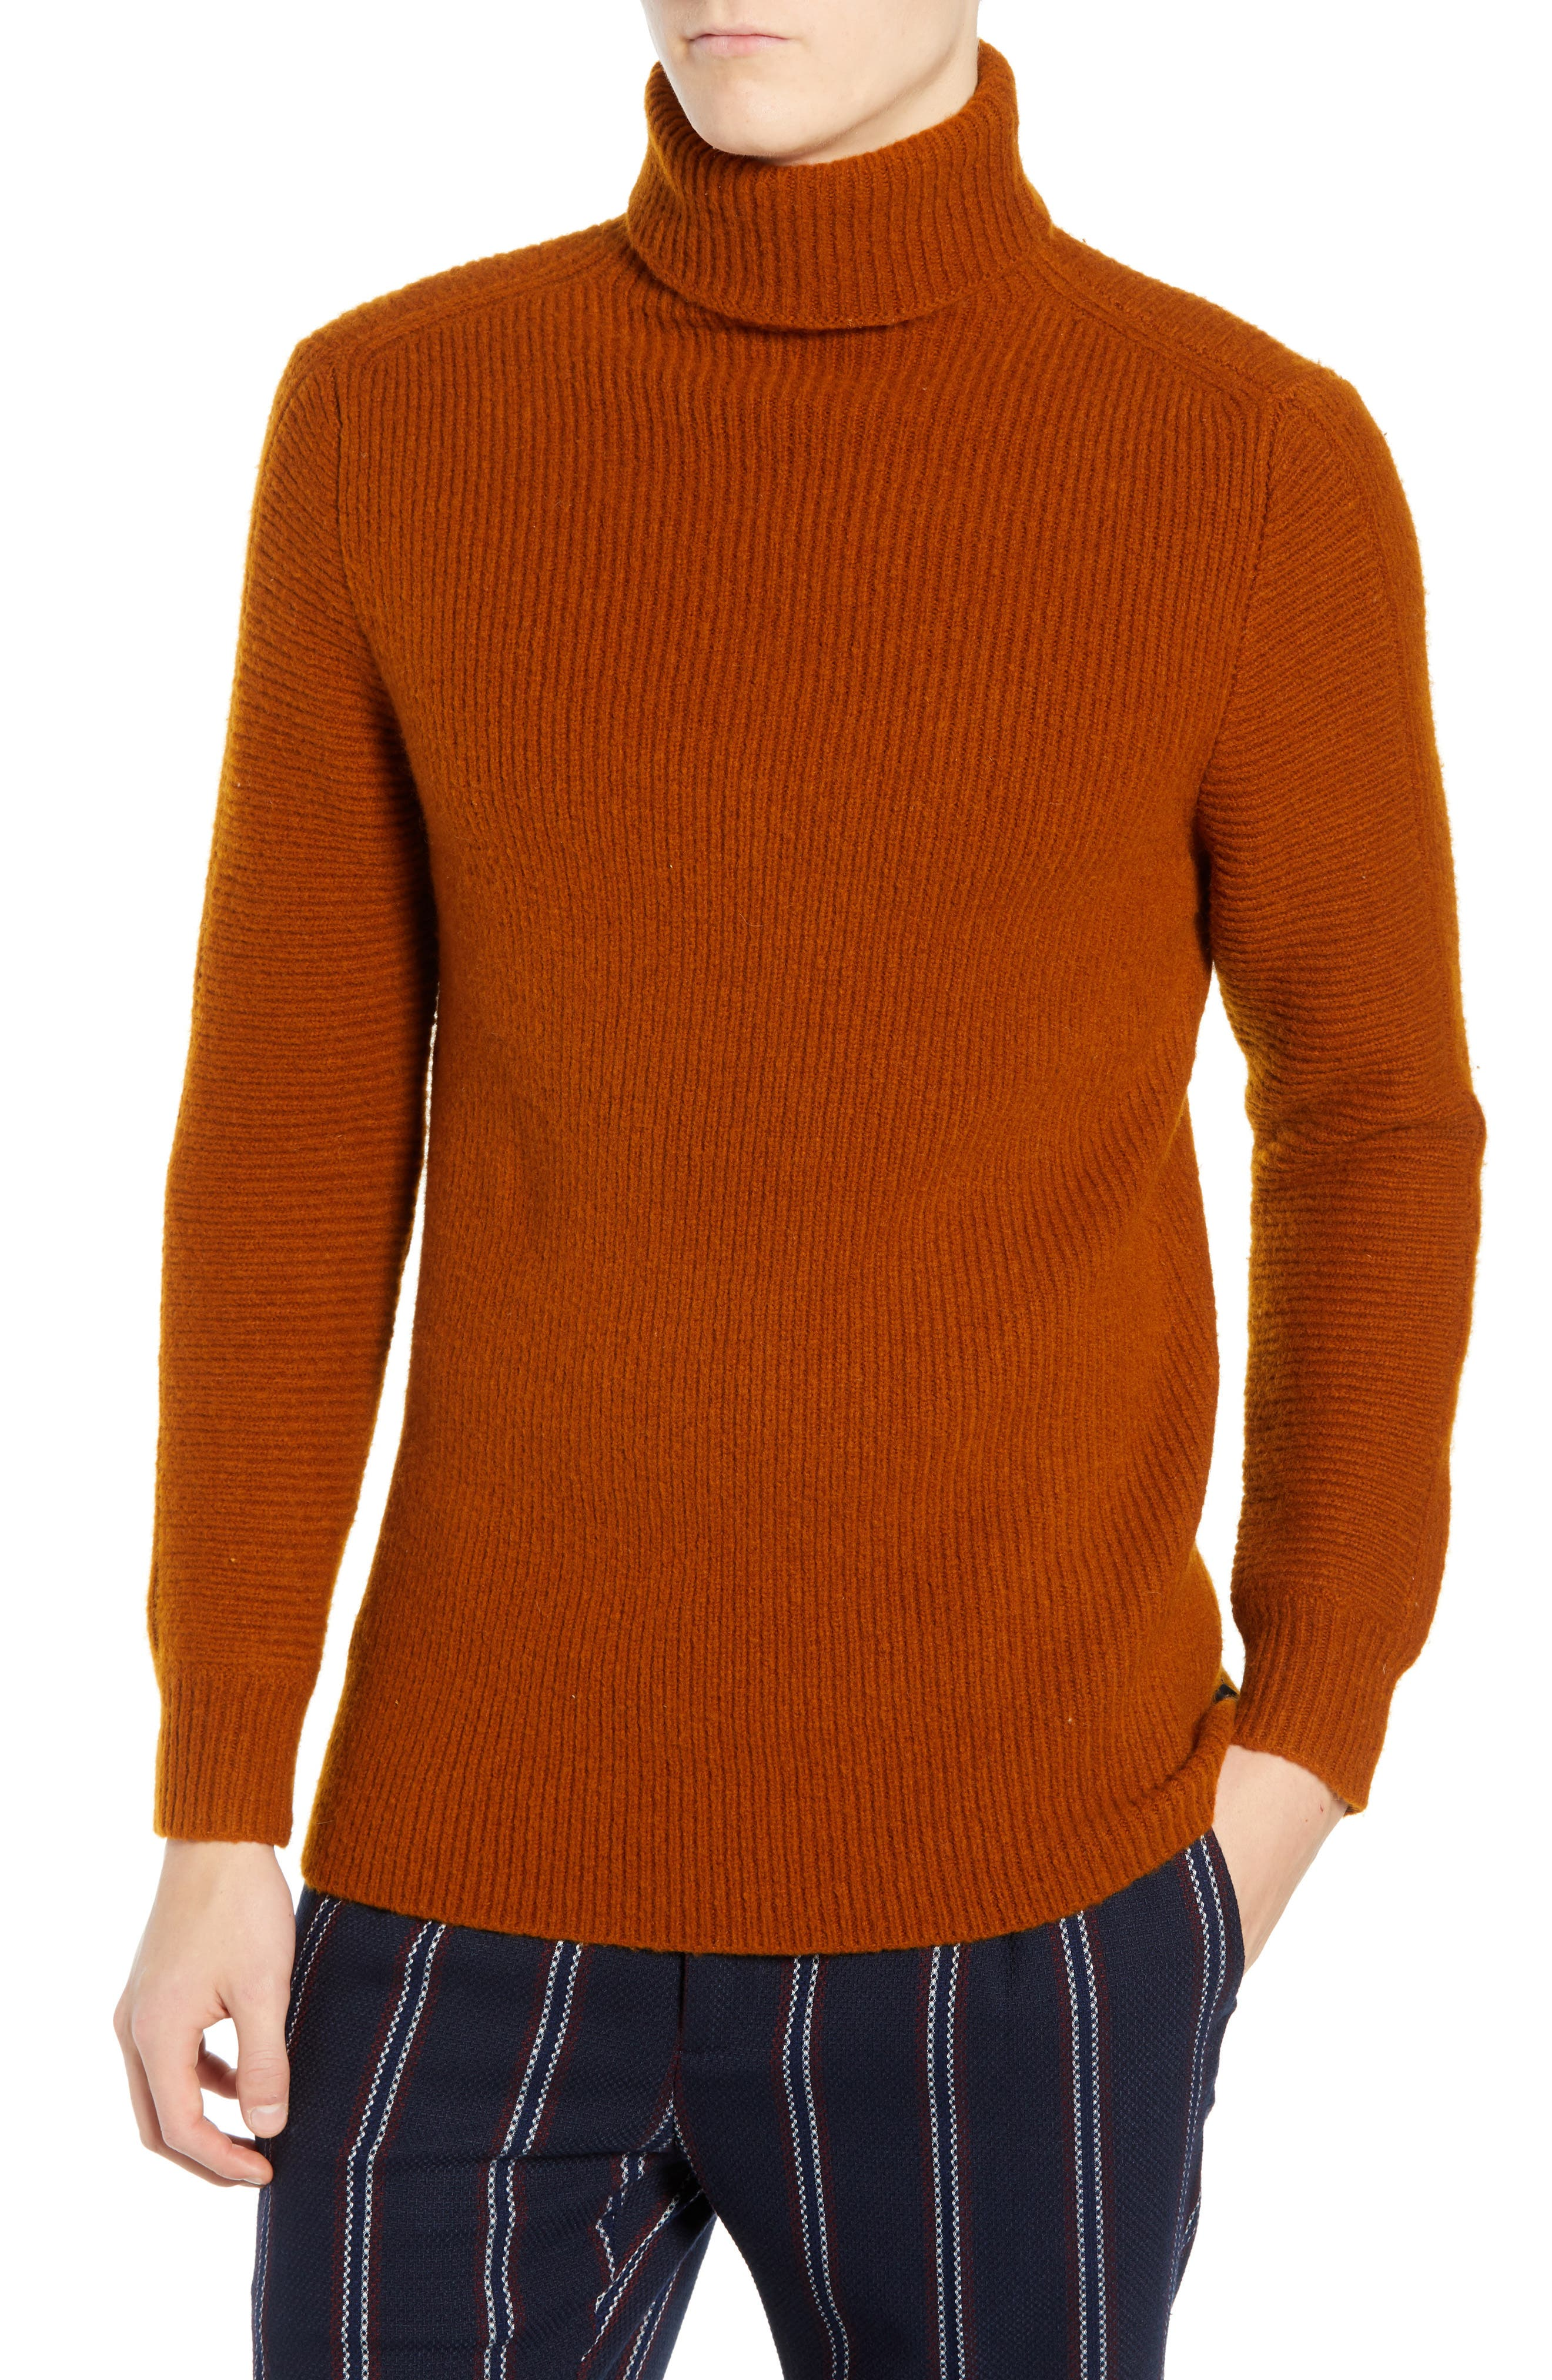 Wool Blend Turtleneck Sweater,                         Main,                         color, RUSSET BROWN